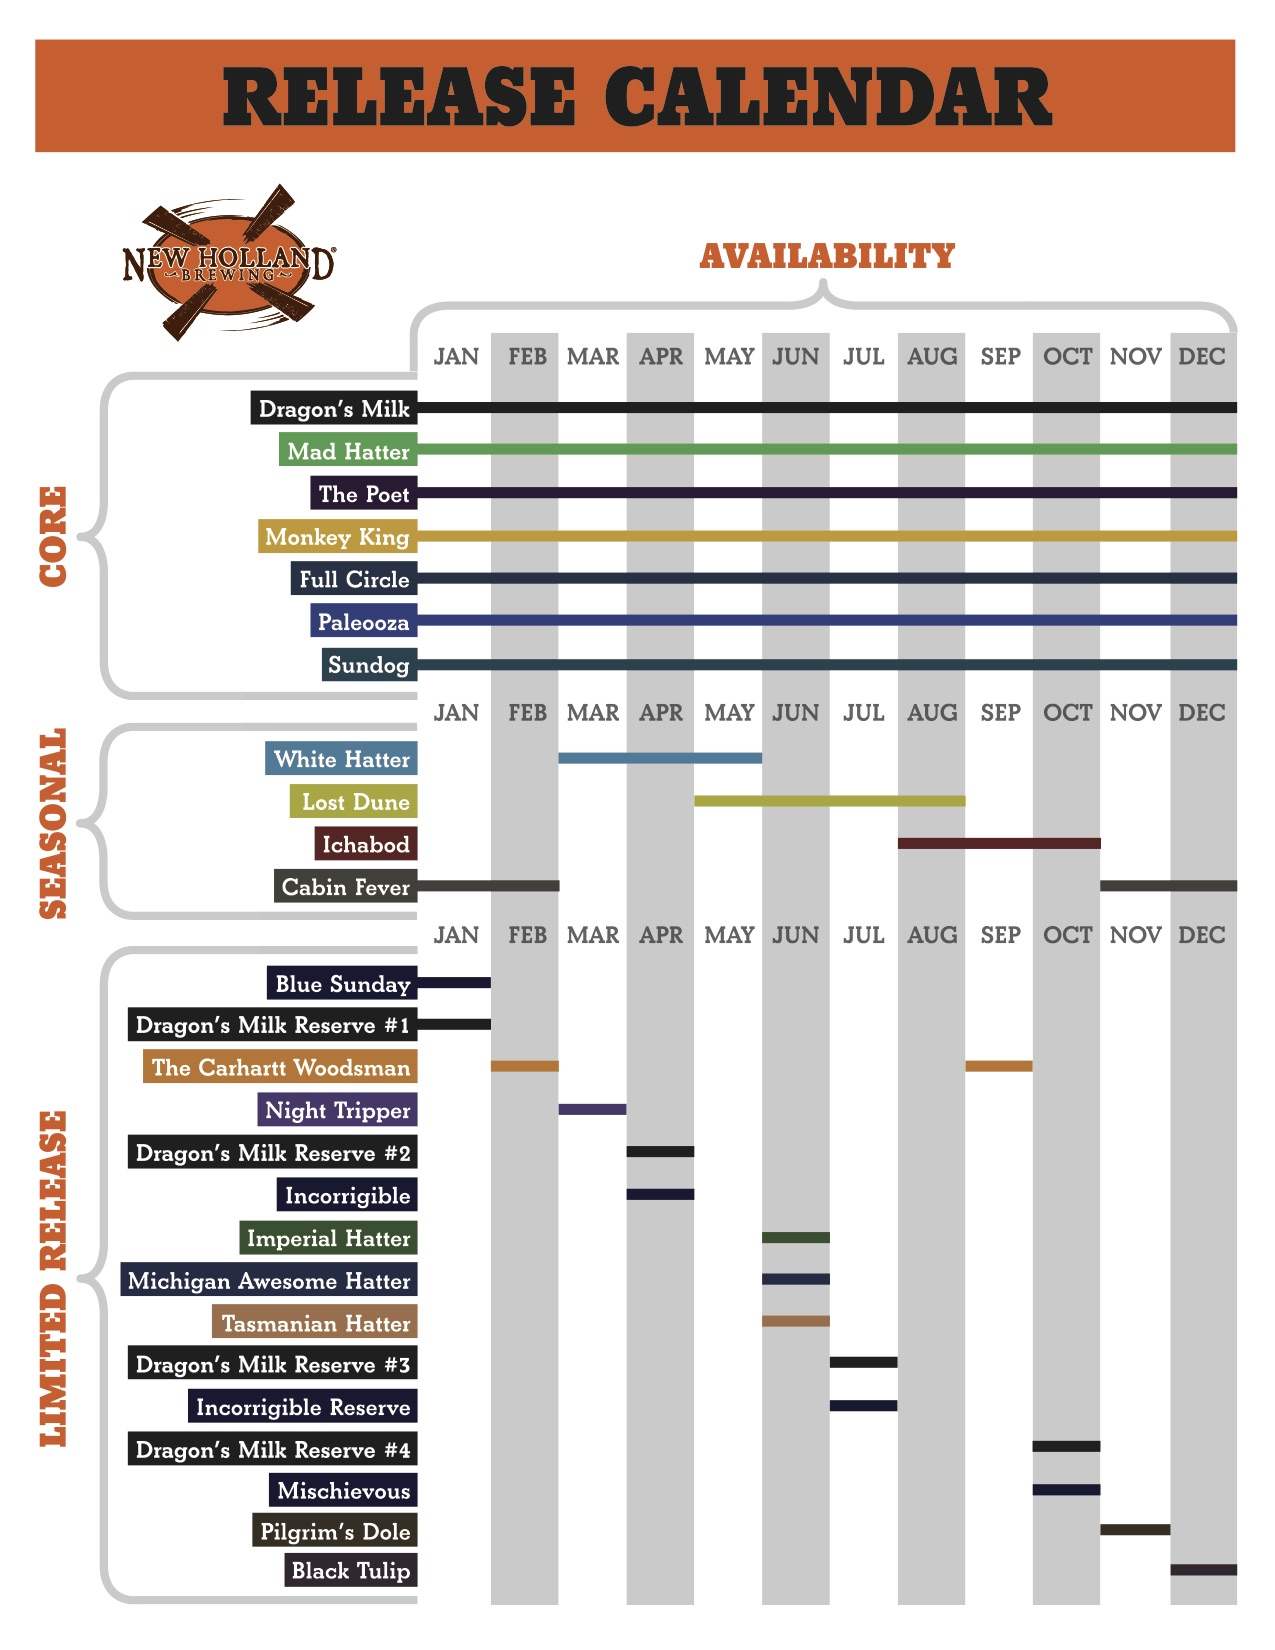 2016 New Holland Brewing Beer Release Calendar